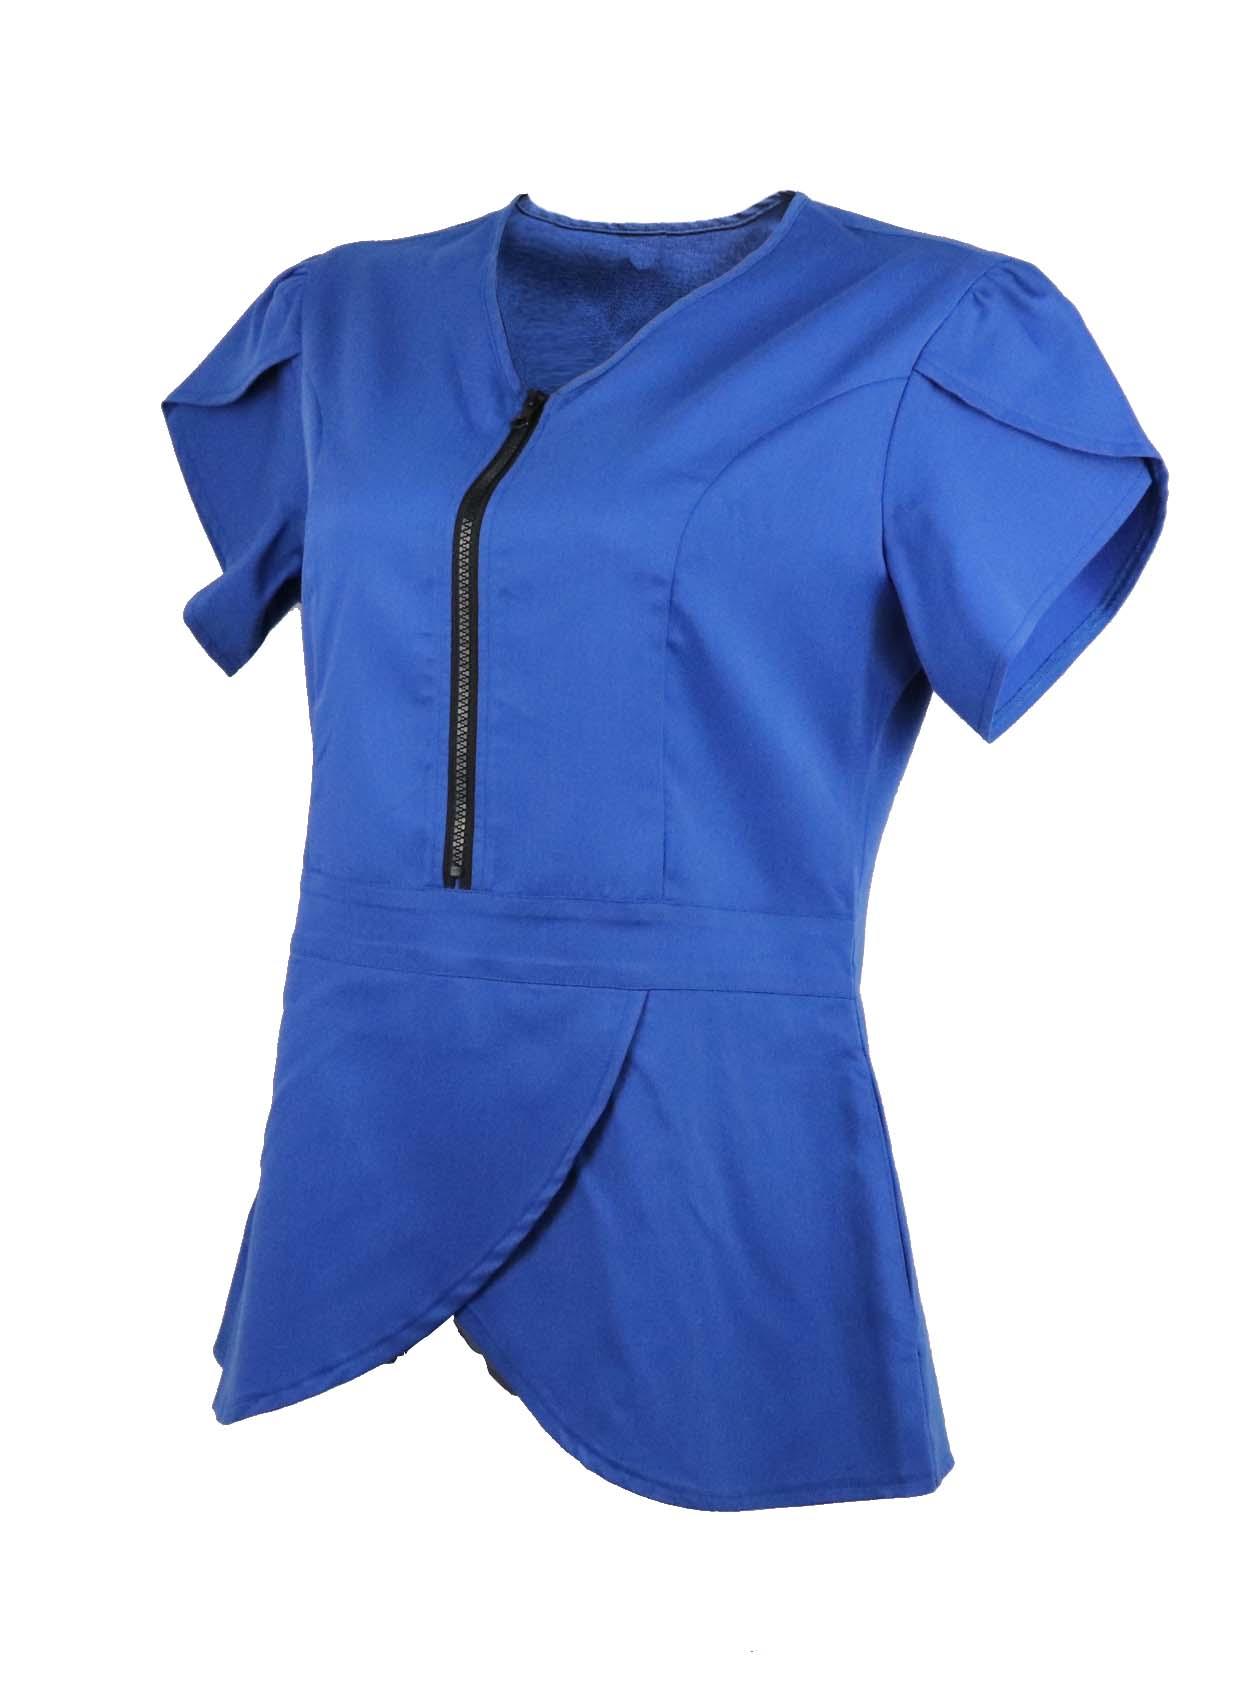 24 Medic si asistent ideas | croitorie, uniforme medicale, tipar pantaloni